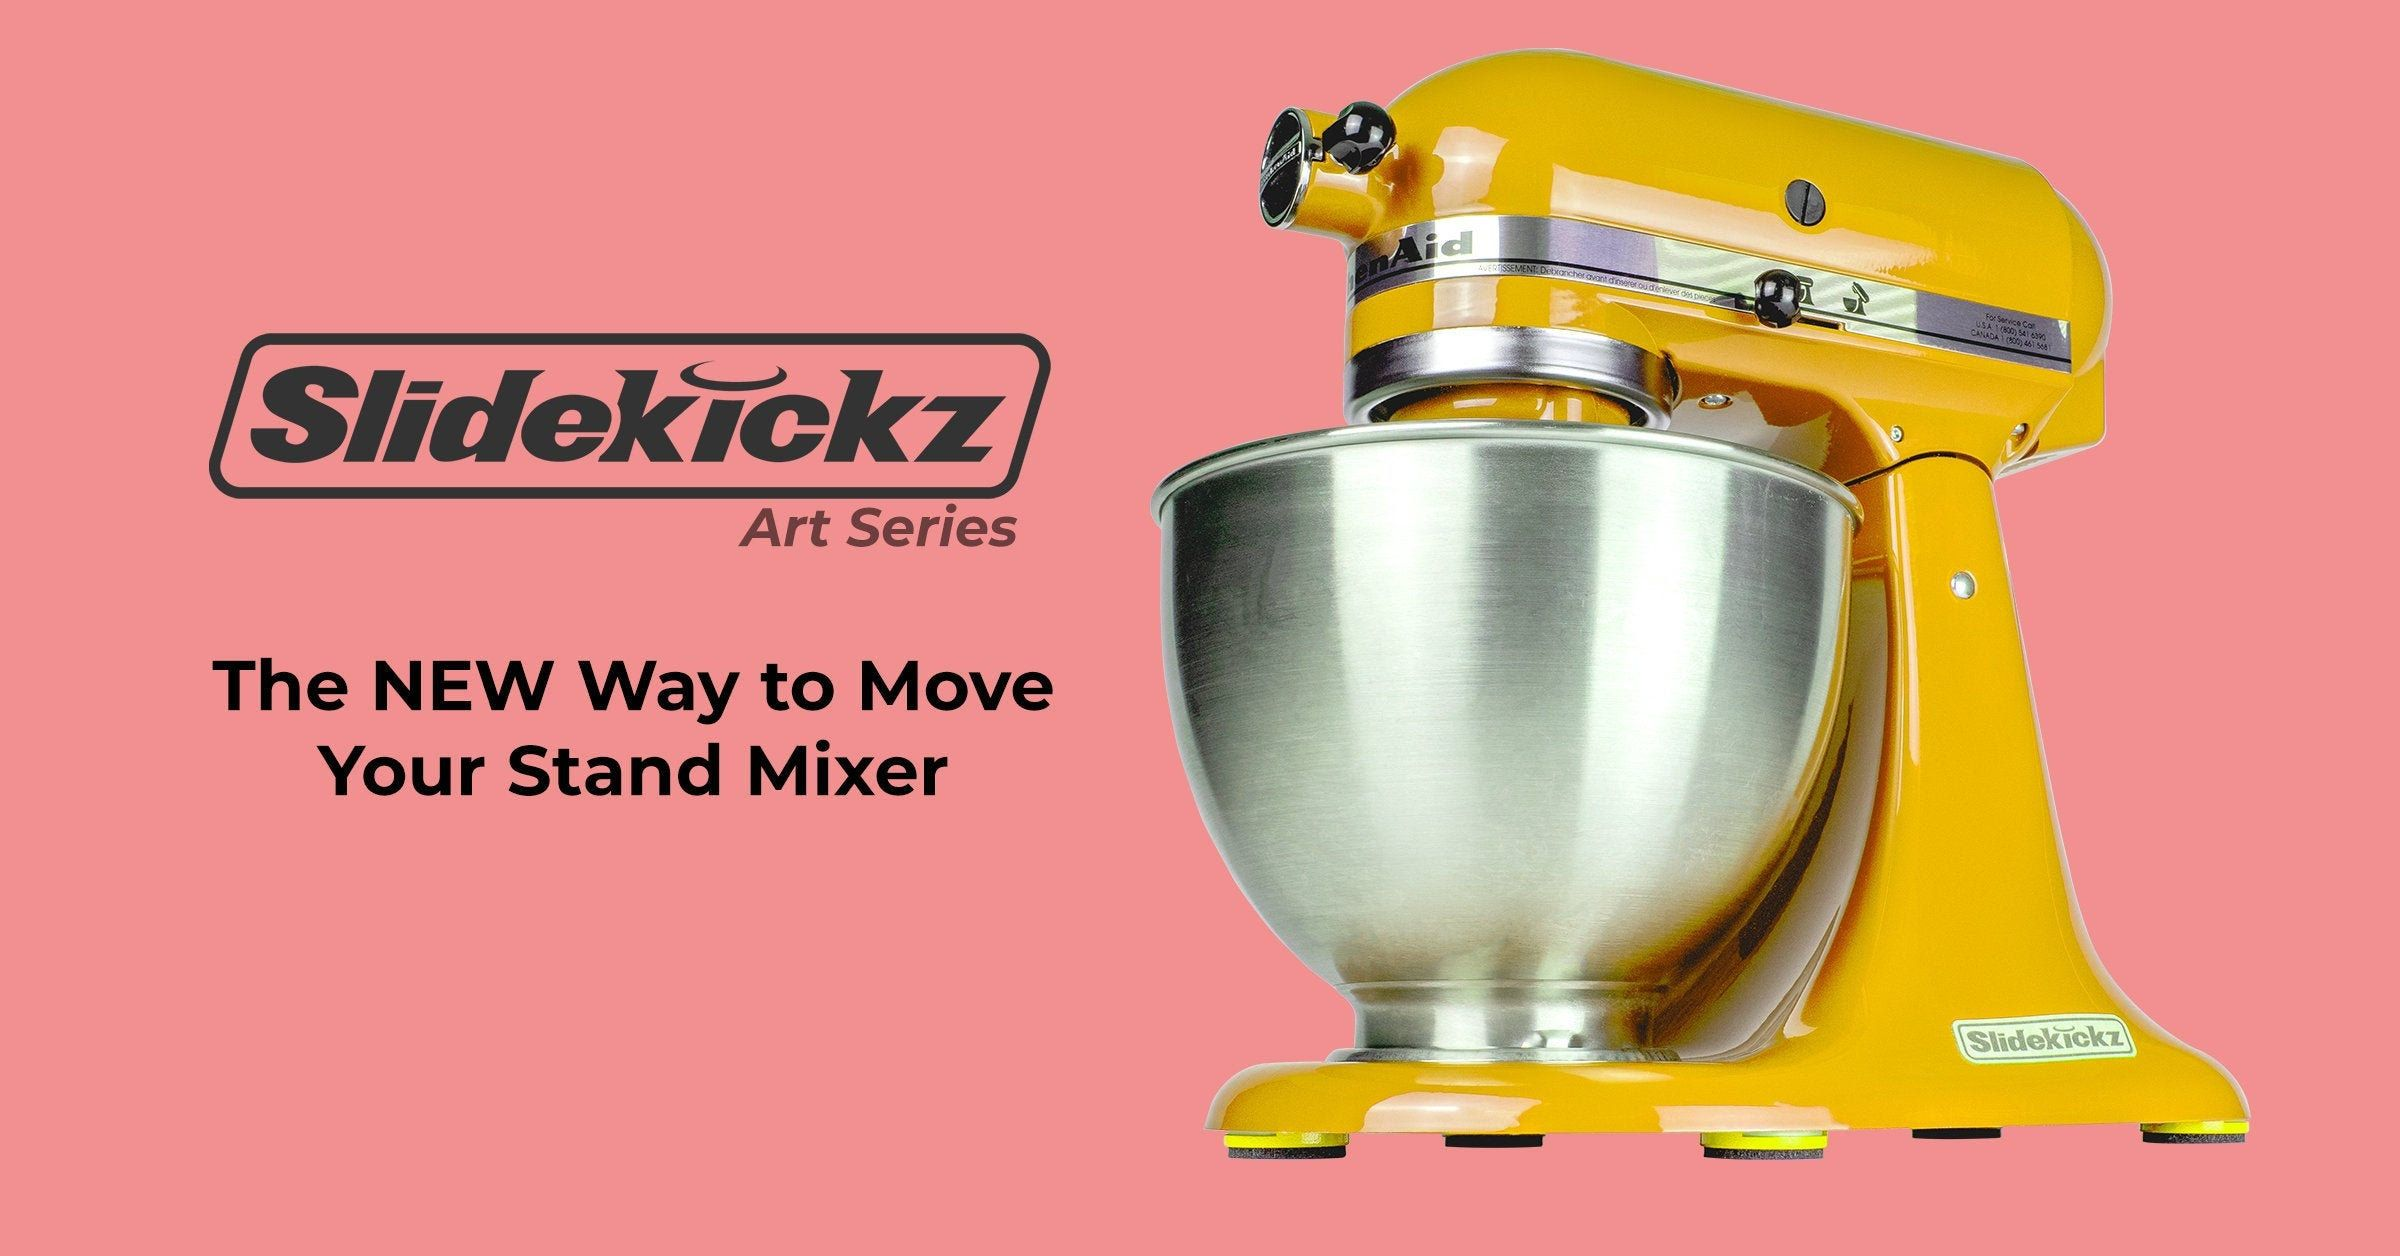 Slidekickz Art Series Mixer Mover Kitchenaid Stand Mixer Etsy Kitchenaid Stand Mixer Mixer Stand Mixer